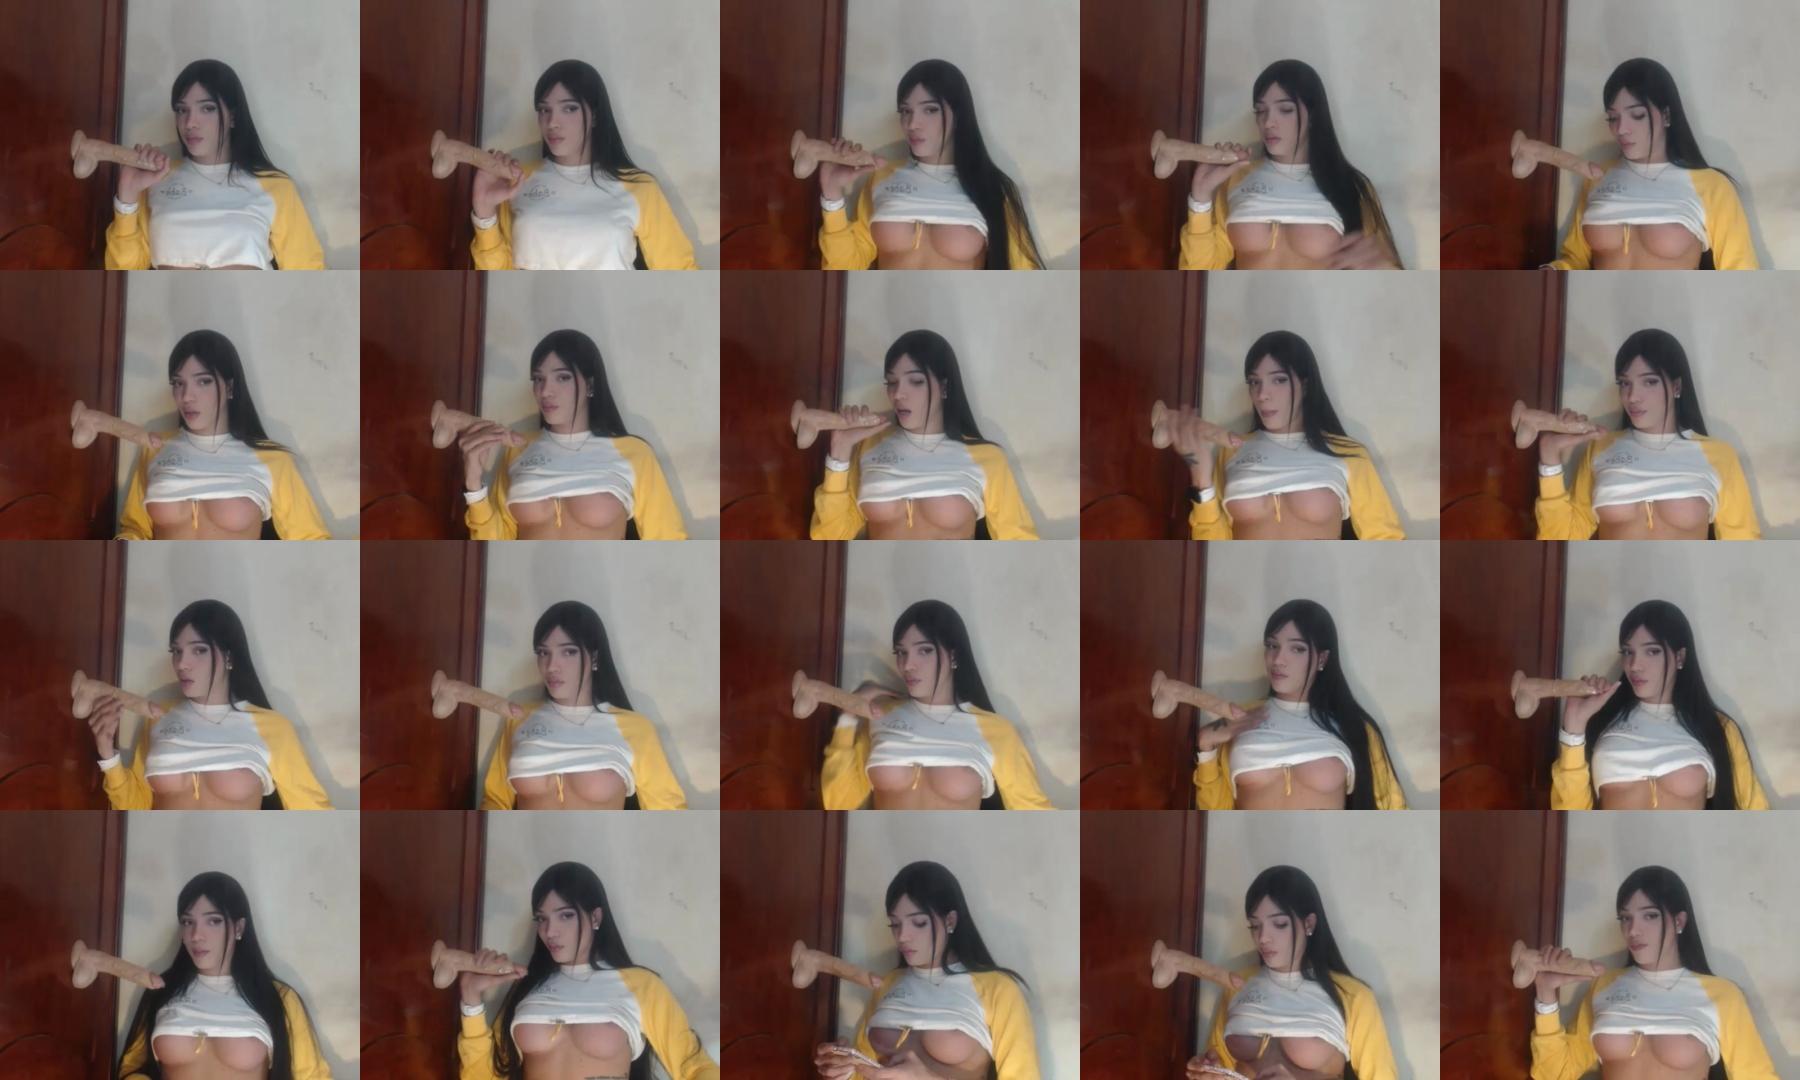 Daniela_Strong ts 23-09-2021 Chaturbate trans Recorded